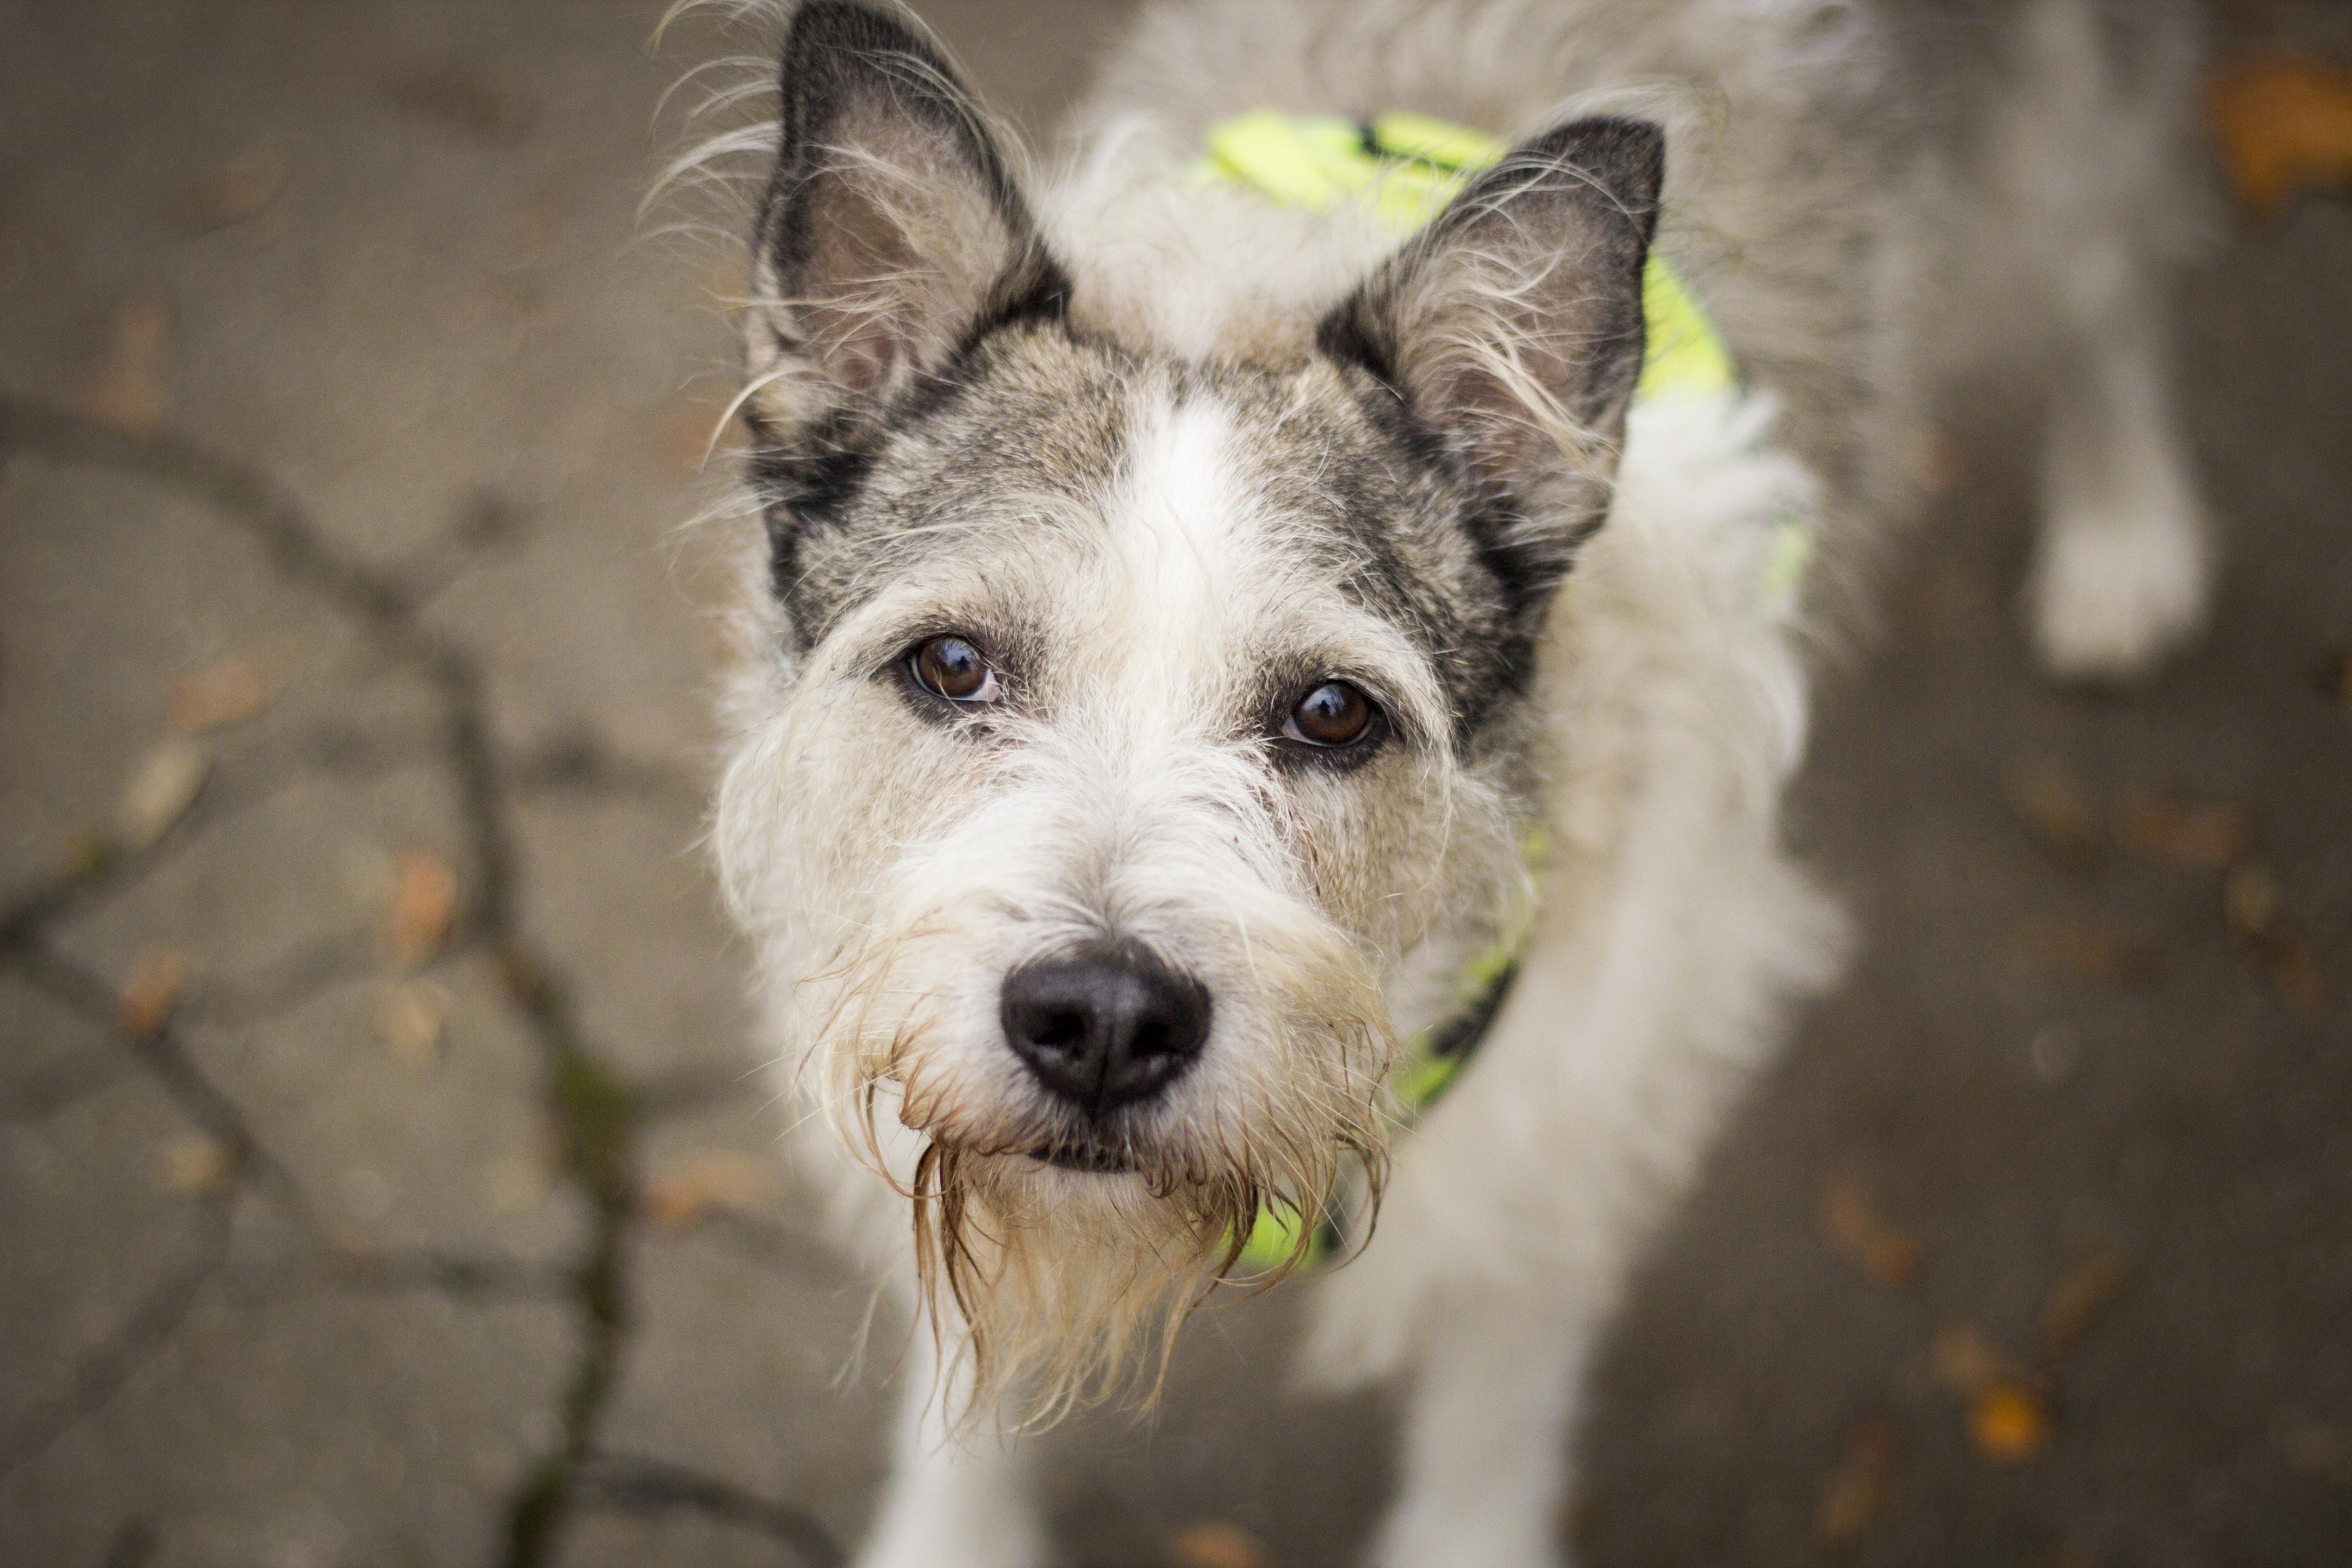 Good Cairn Terrier Ball Adorable Dog - dog-animal-cute-canine-pet-park-mammal-outdoors-head-vertebrate-schnauzer-miniature-schnauzer-dog-breed-terrier-cairn-terrier-dog-like-mammal-west-highland-white-terrier-glen-of-imaal-terrier-dog-crossbreeds-1278883  Image_104270  .jpg